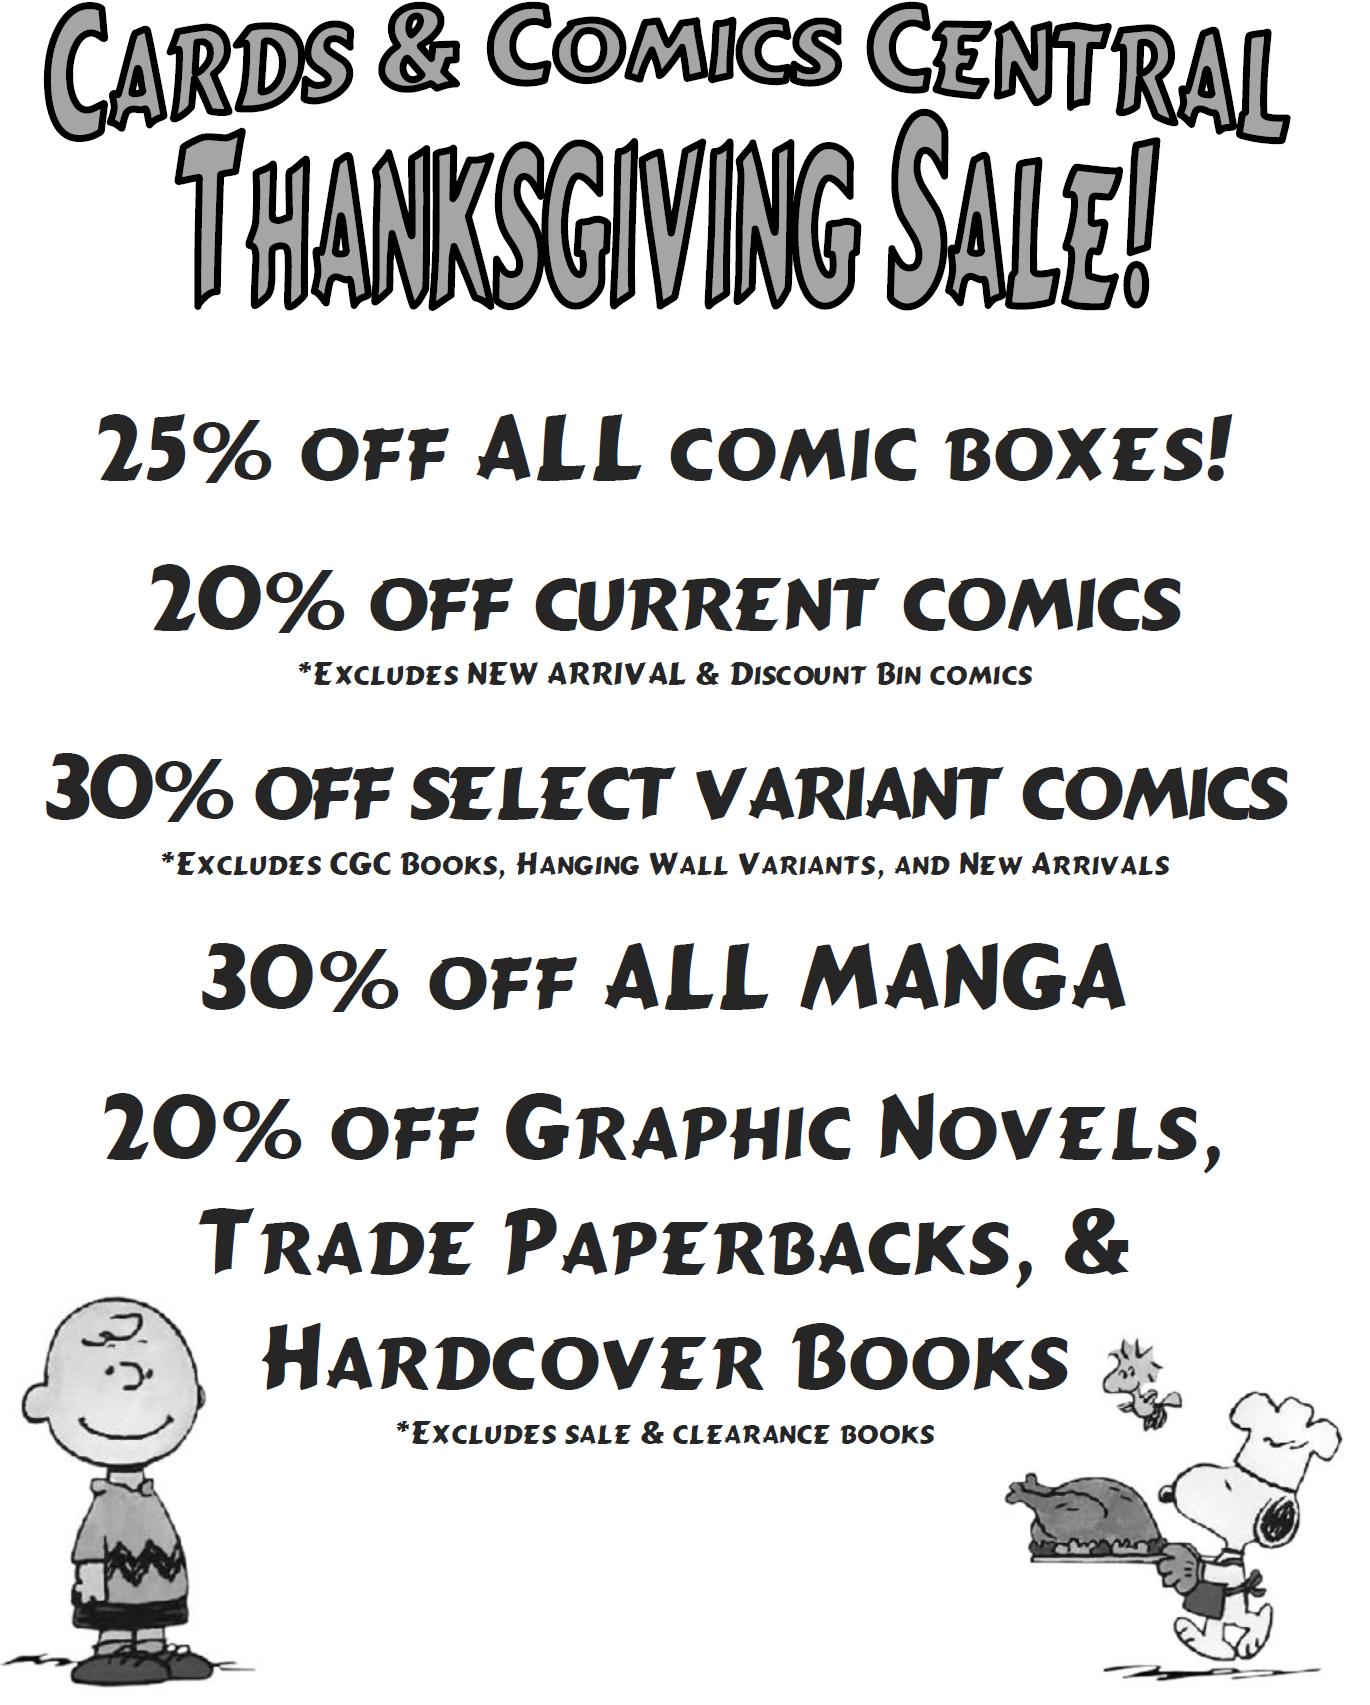 ThanksgivingSale_COMICS.png